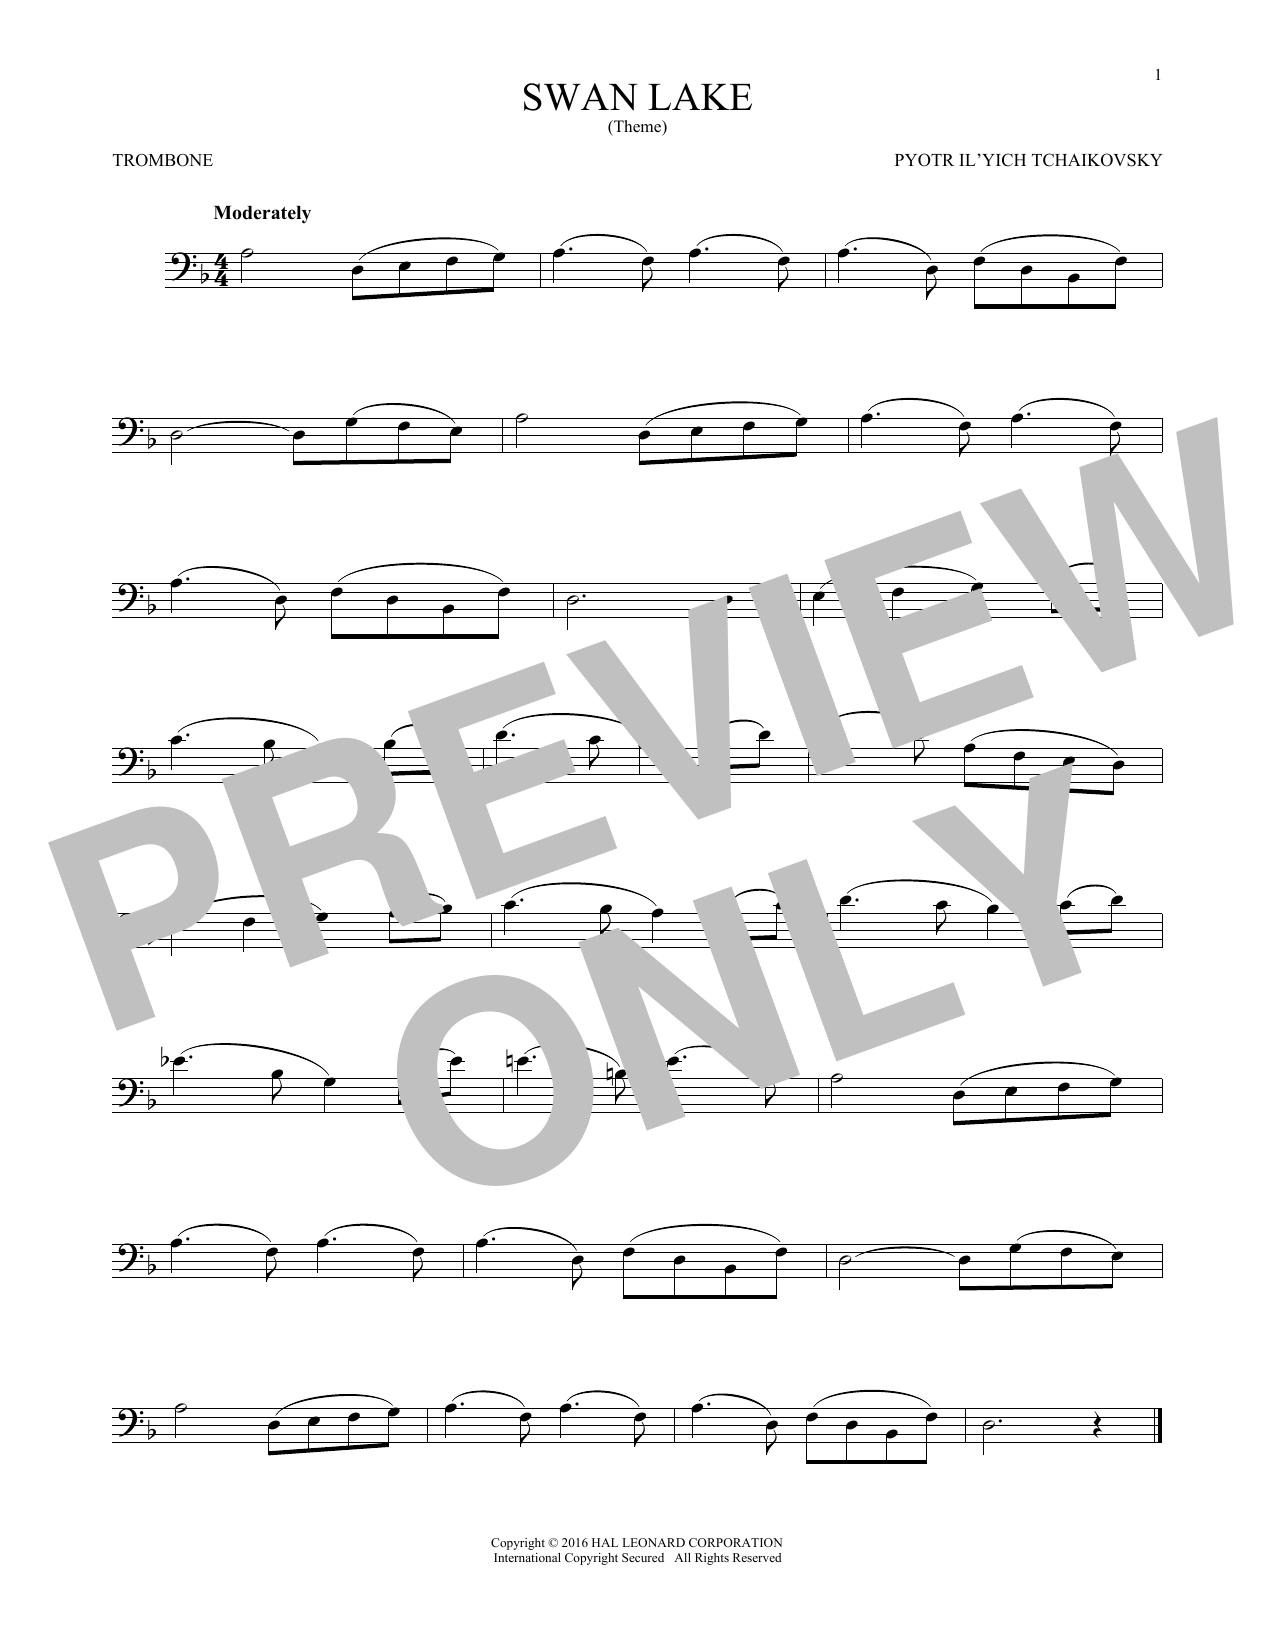 Theme From Swan Lake (Trombone Solo)